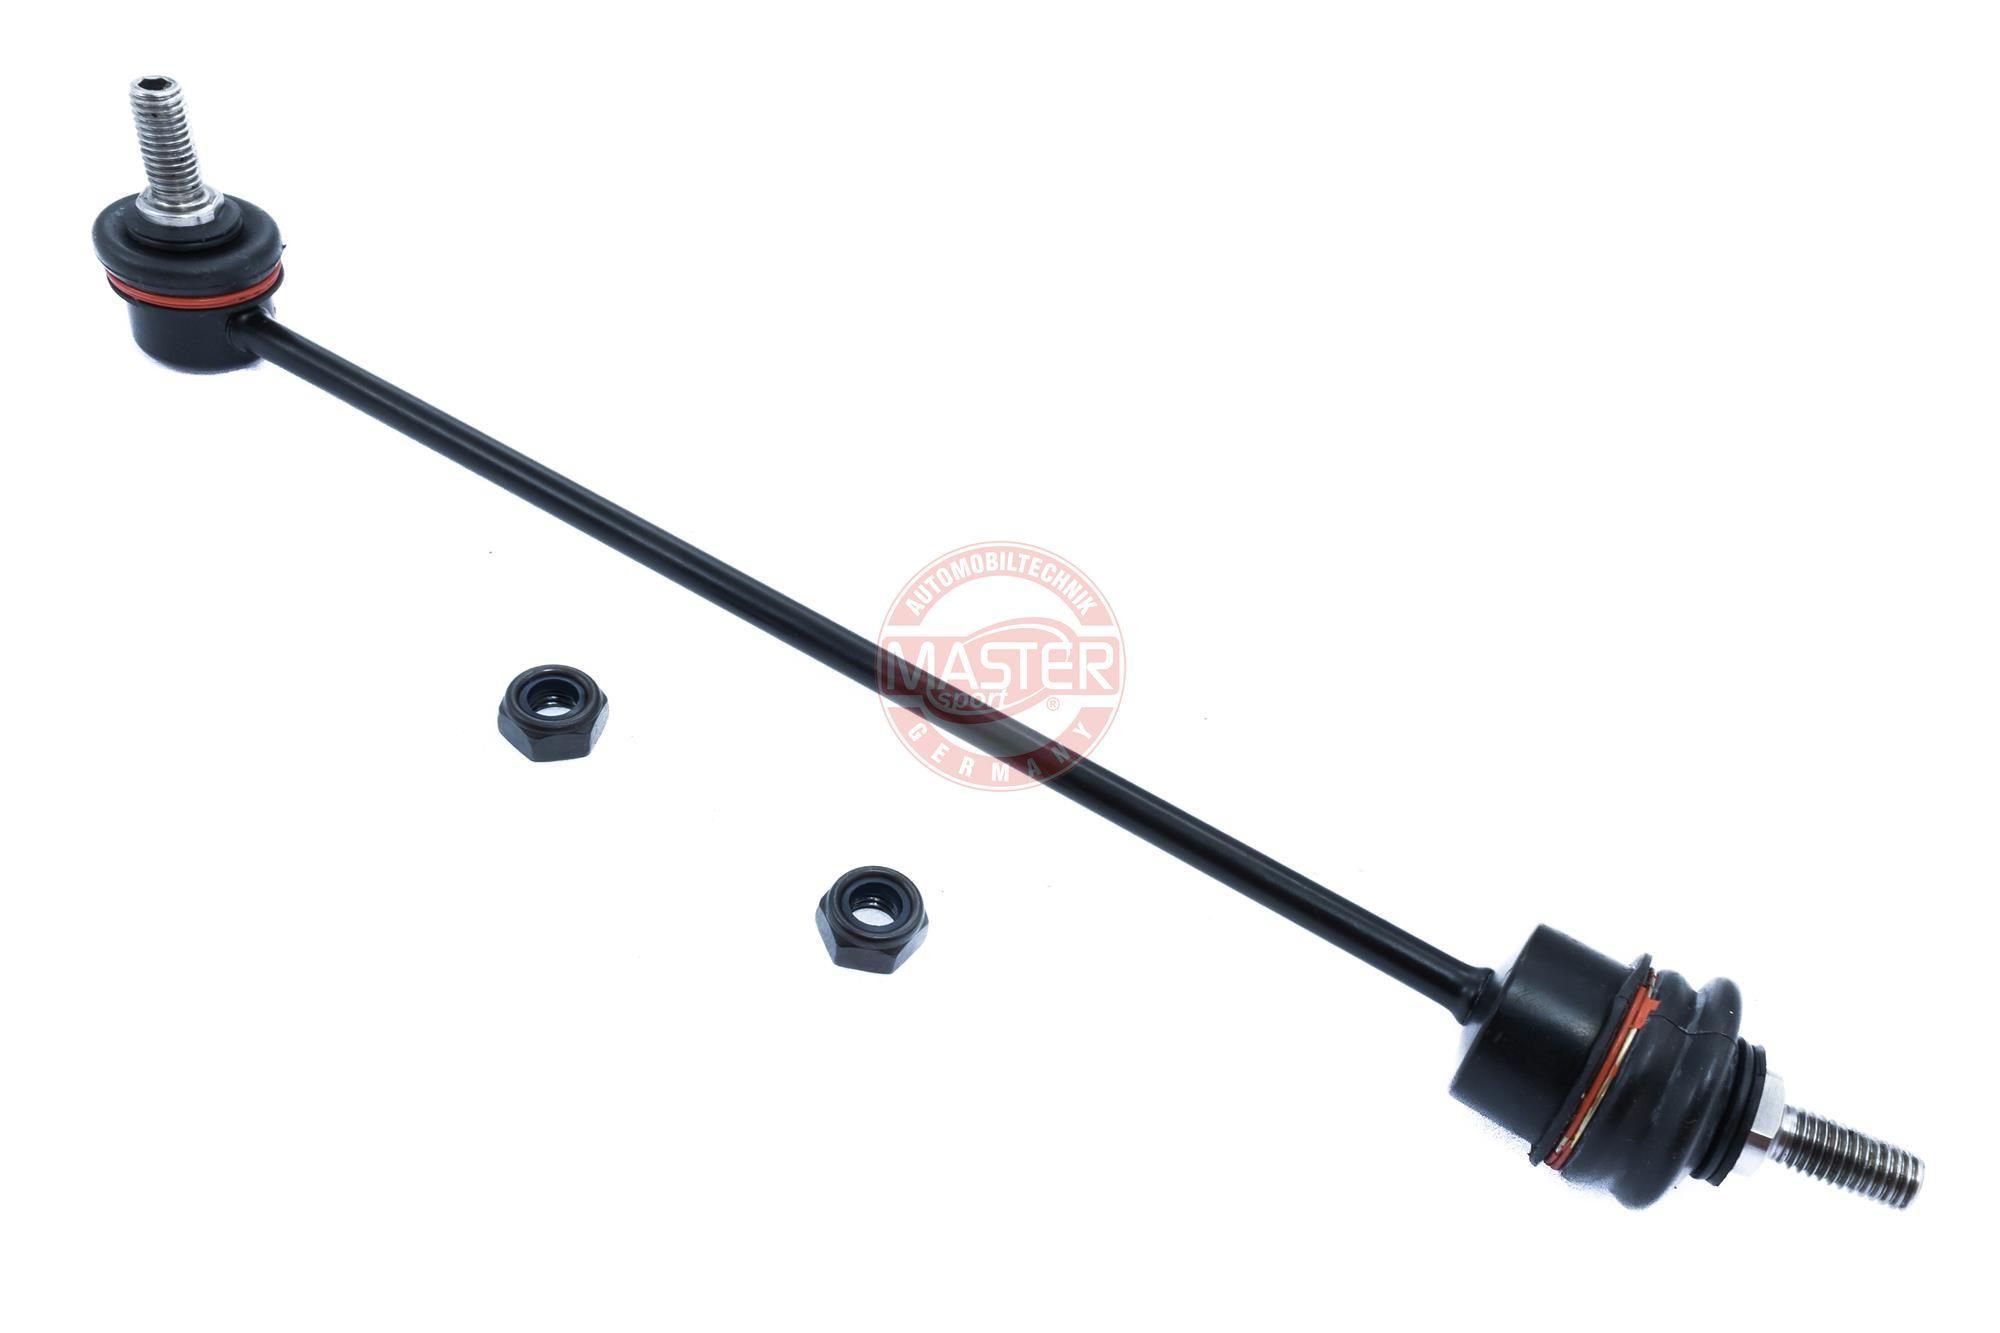 Koppelstange 25386-PCS-MS MASTER-SPORT 132538601 in Original Qualität